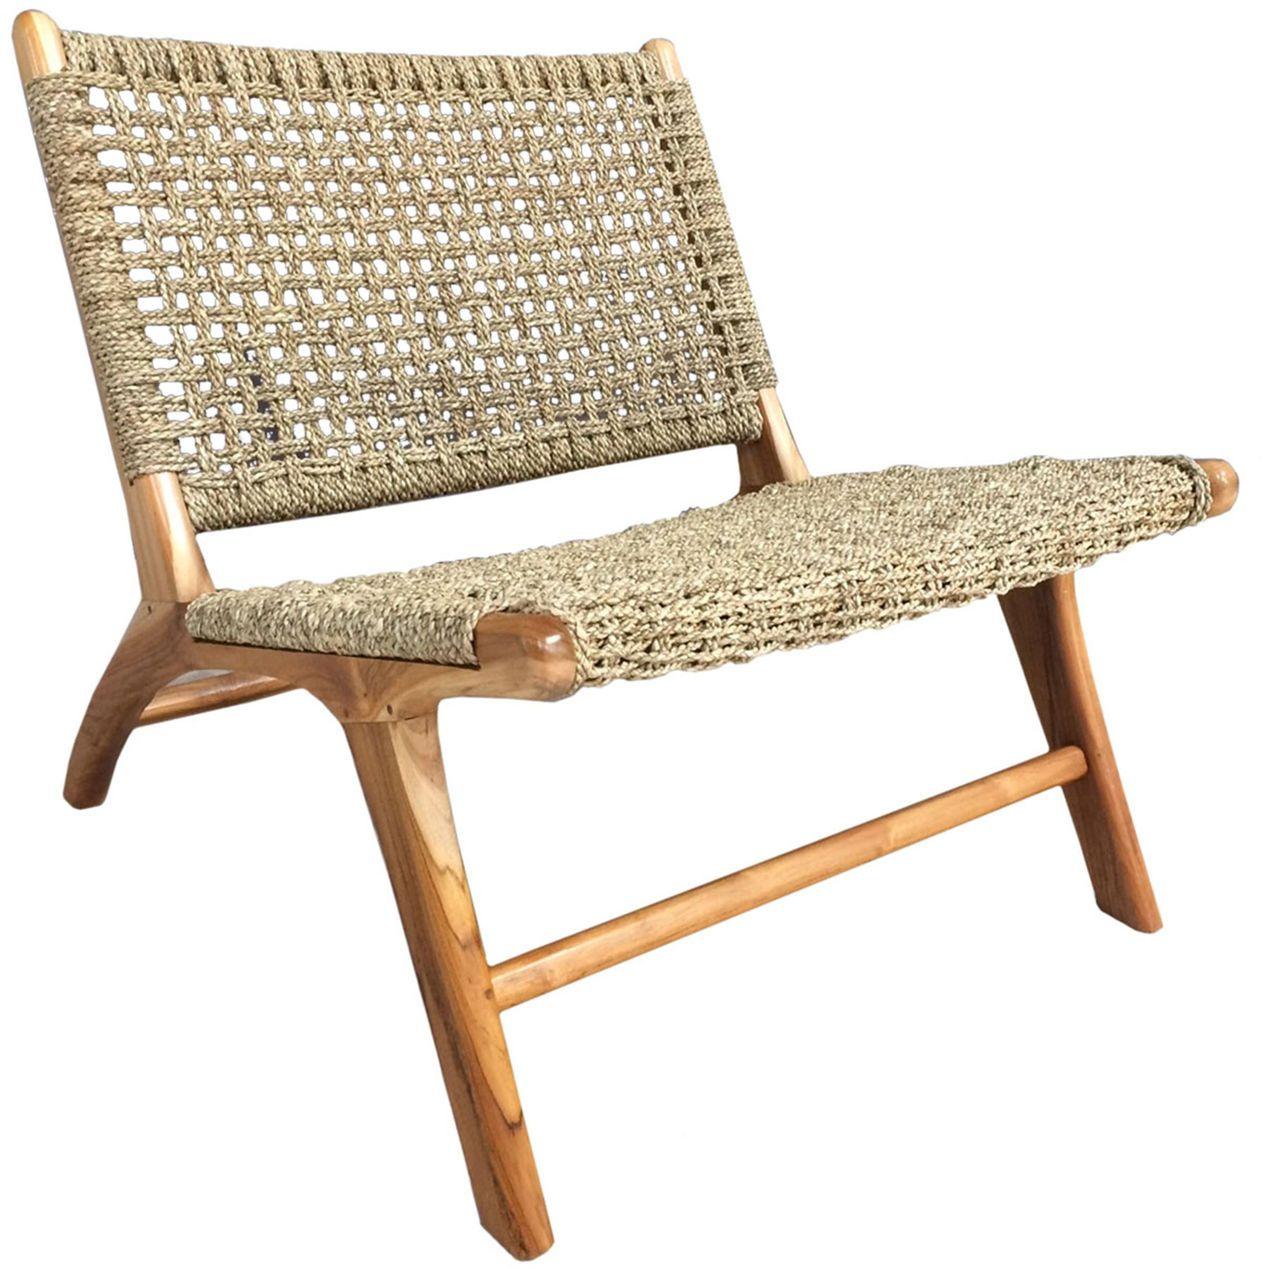 London Seagrass Teak Chair At Home Teak Chairs Backyard Furniture Teak Patio Furniture